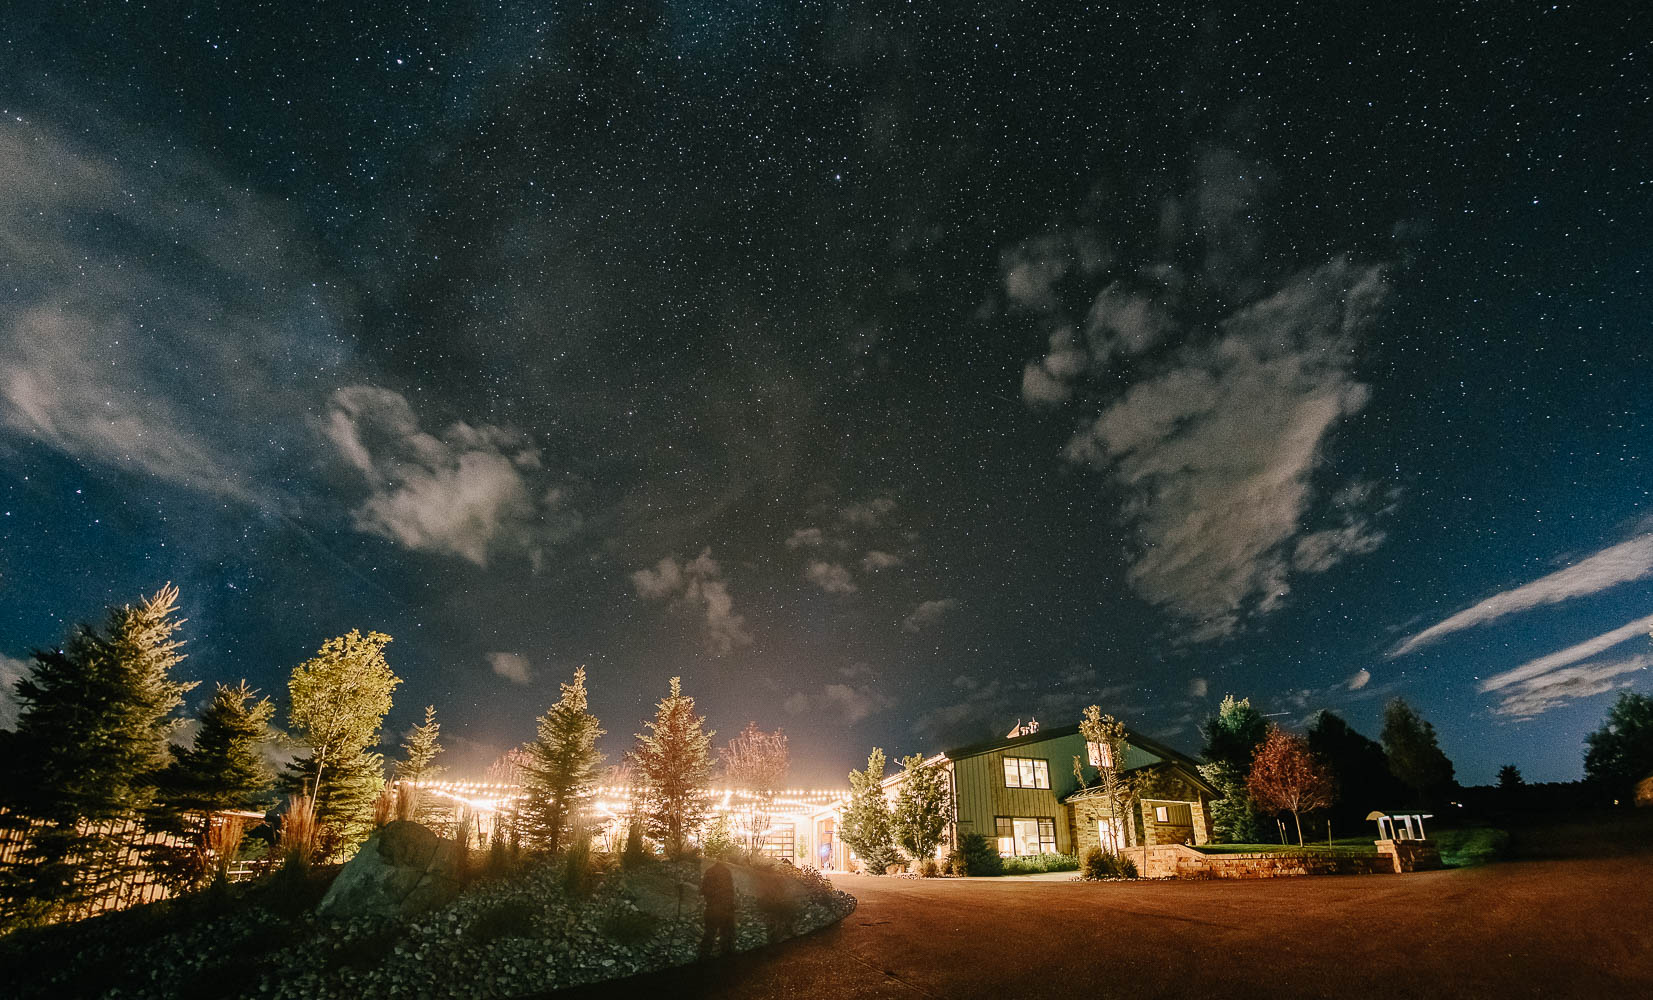 160902-Luxium-Weddings-Arizona-Michael-Becca-Spruce-Mountain-Ranch-Colorado-webres-112a.jpg